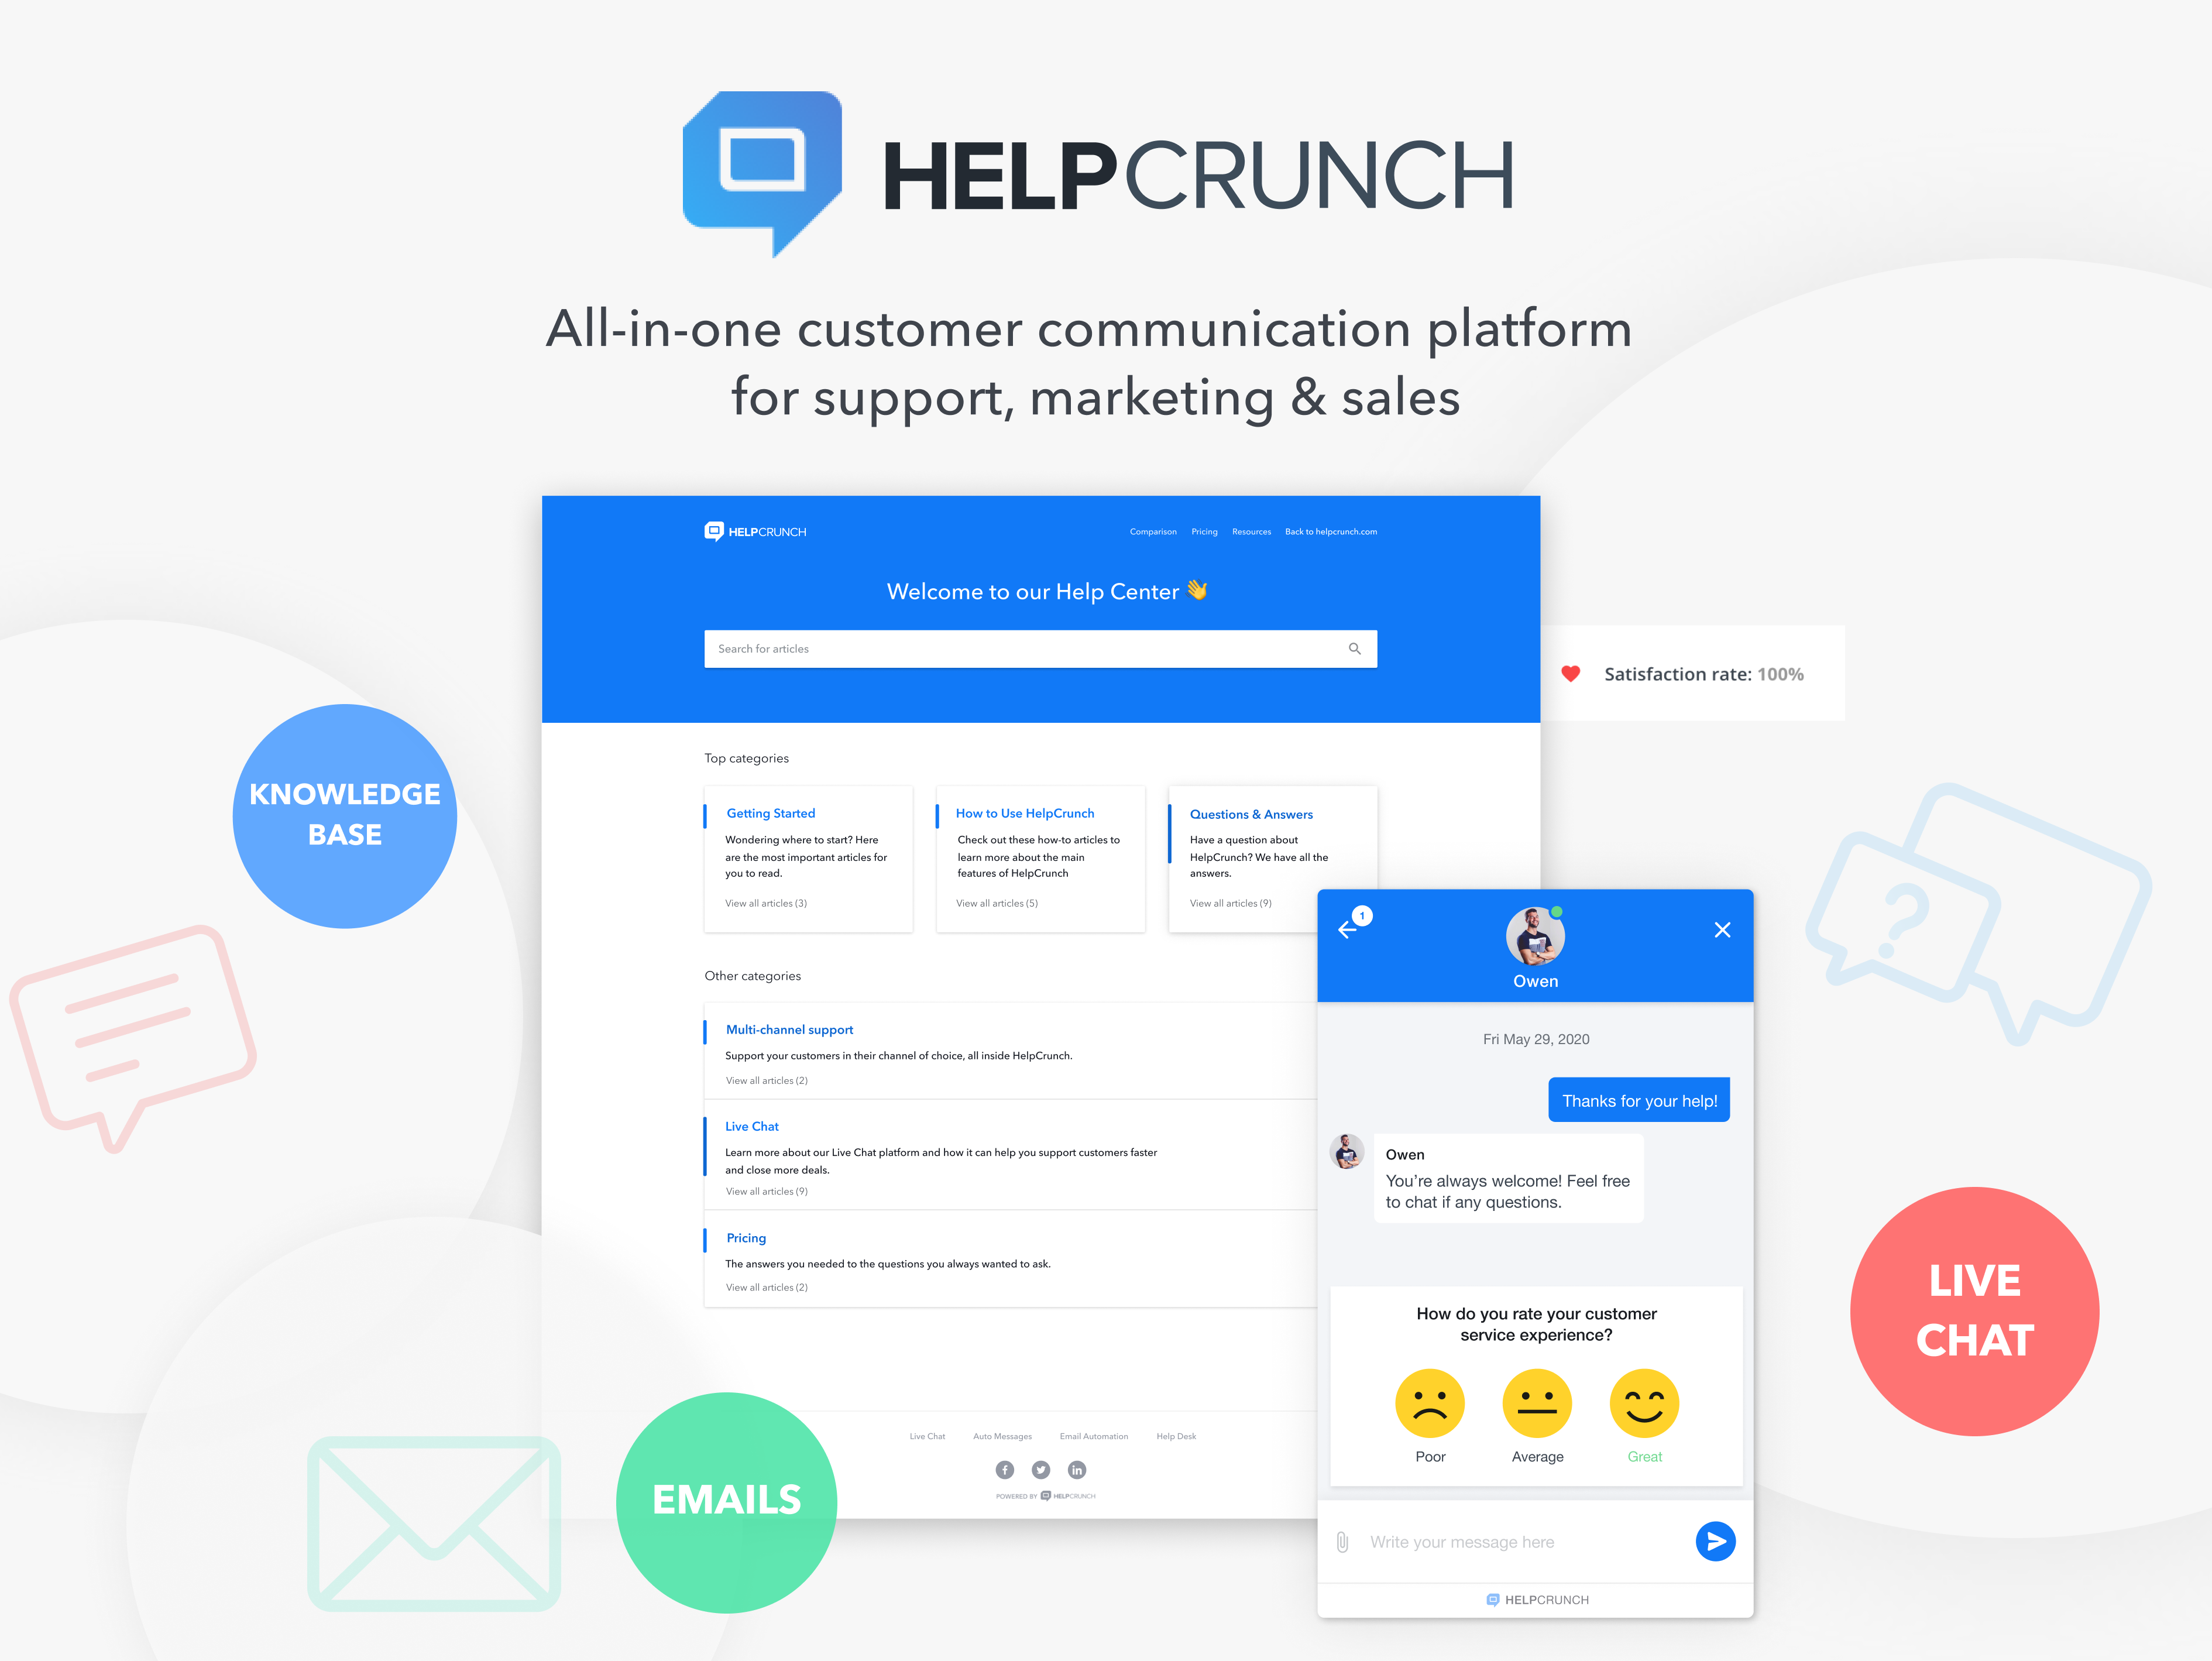 HelpCrunch screenshot: All-in-one customer communication platform